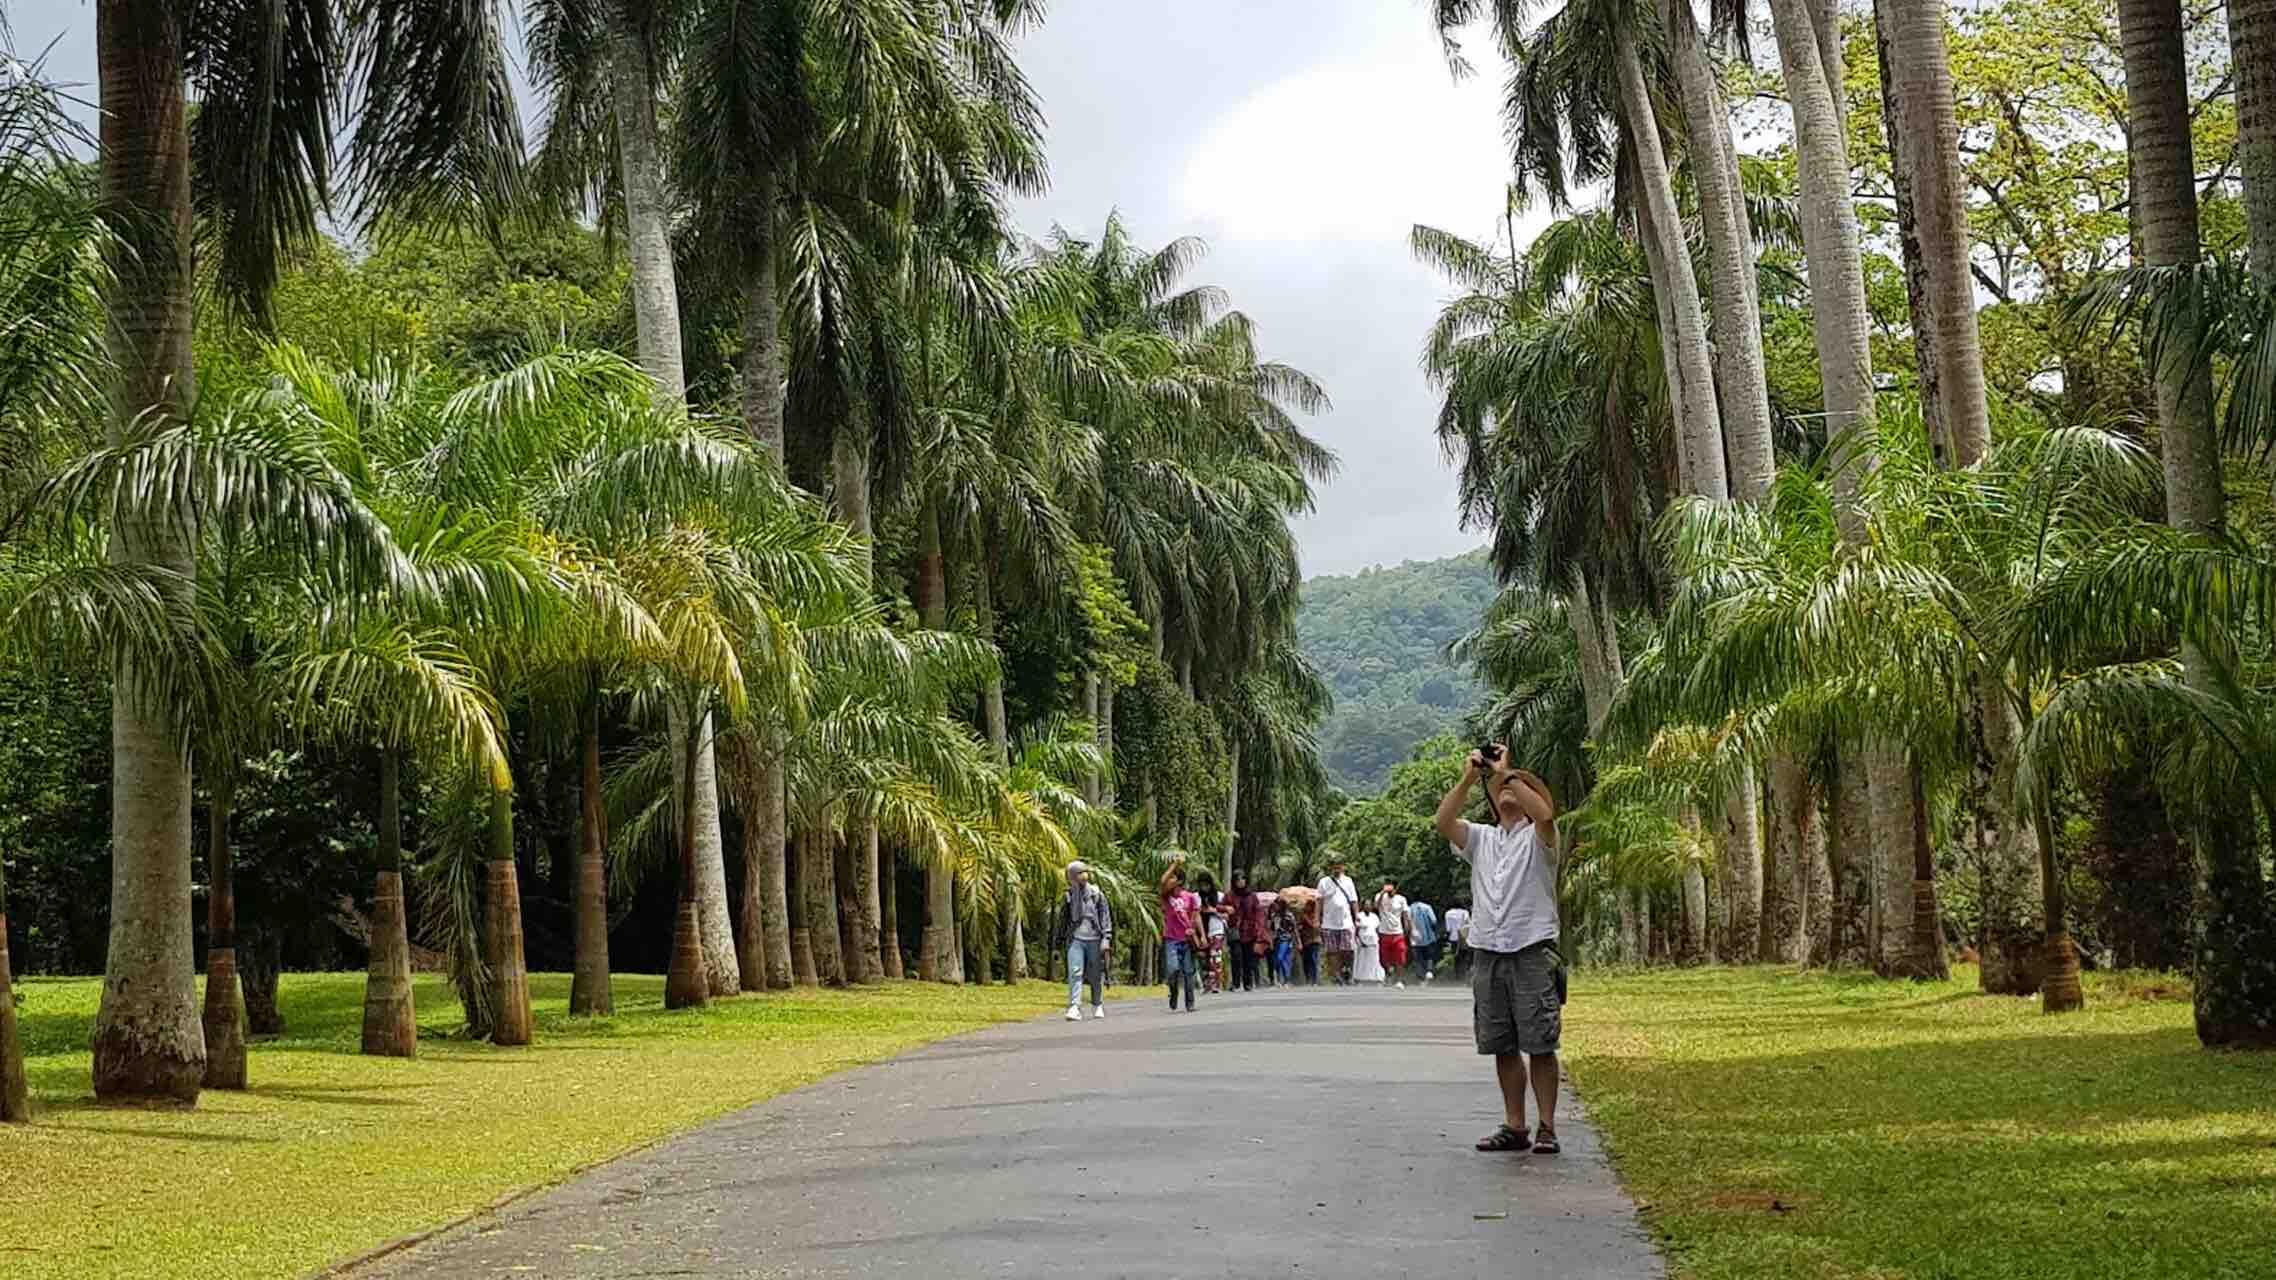 sri-lanka-kandy-royal-botanical-gardens-people-holiday-review-feedback-invite-to-paradise-quentin-kate-hulm.jpg